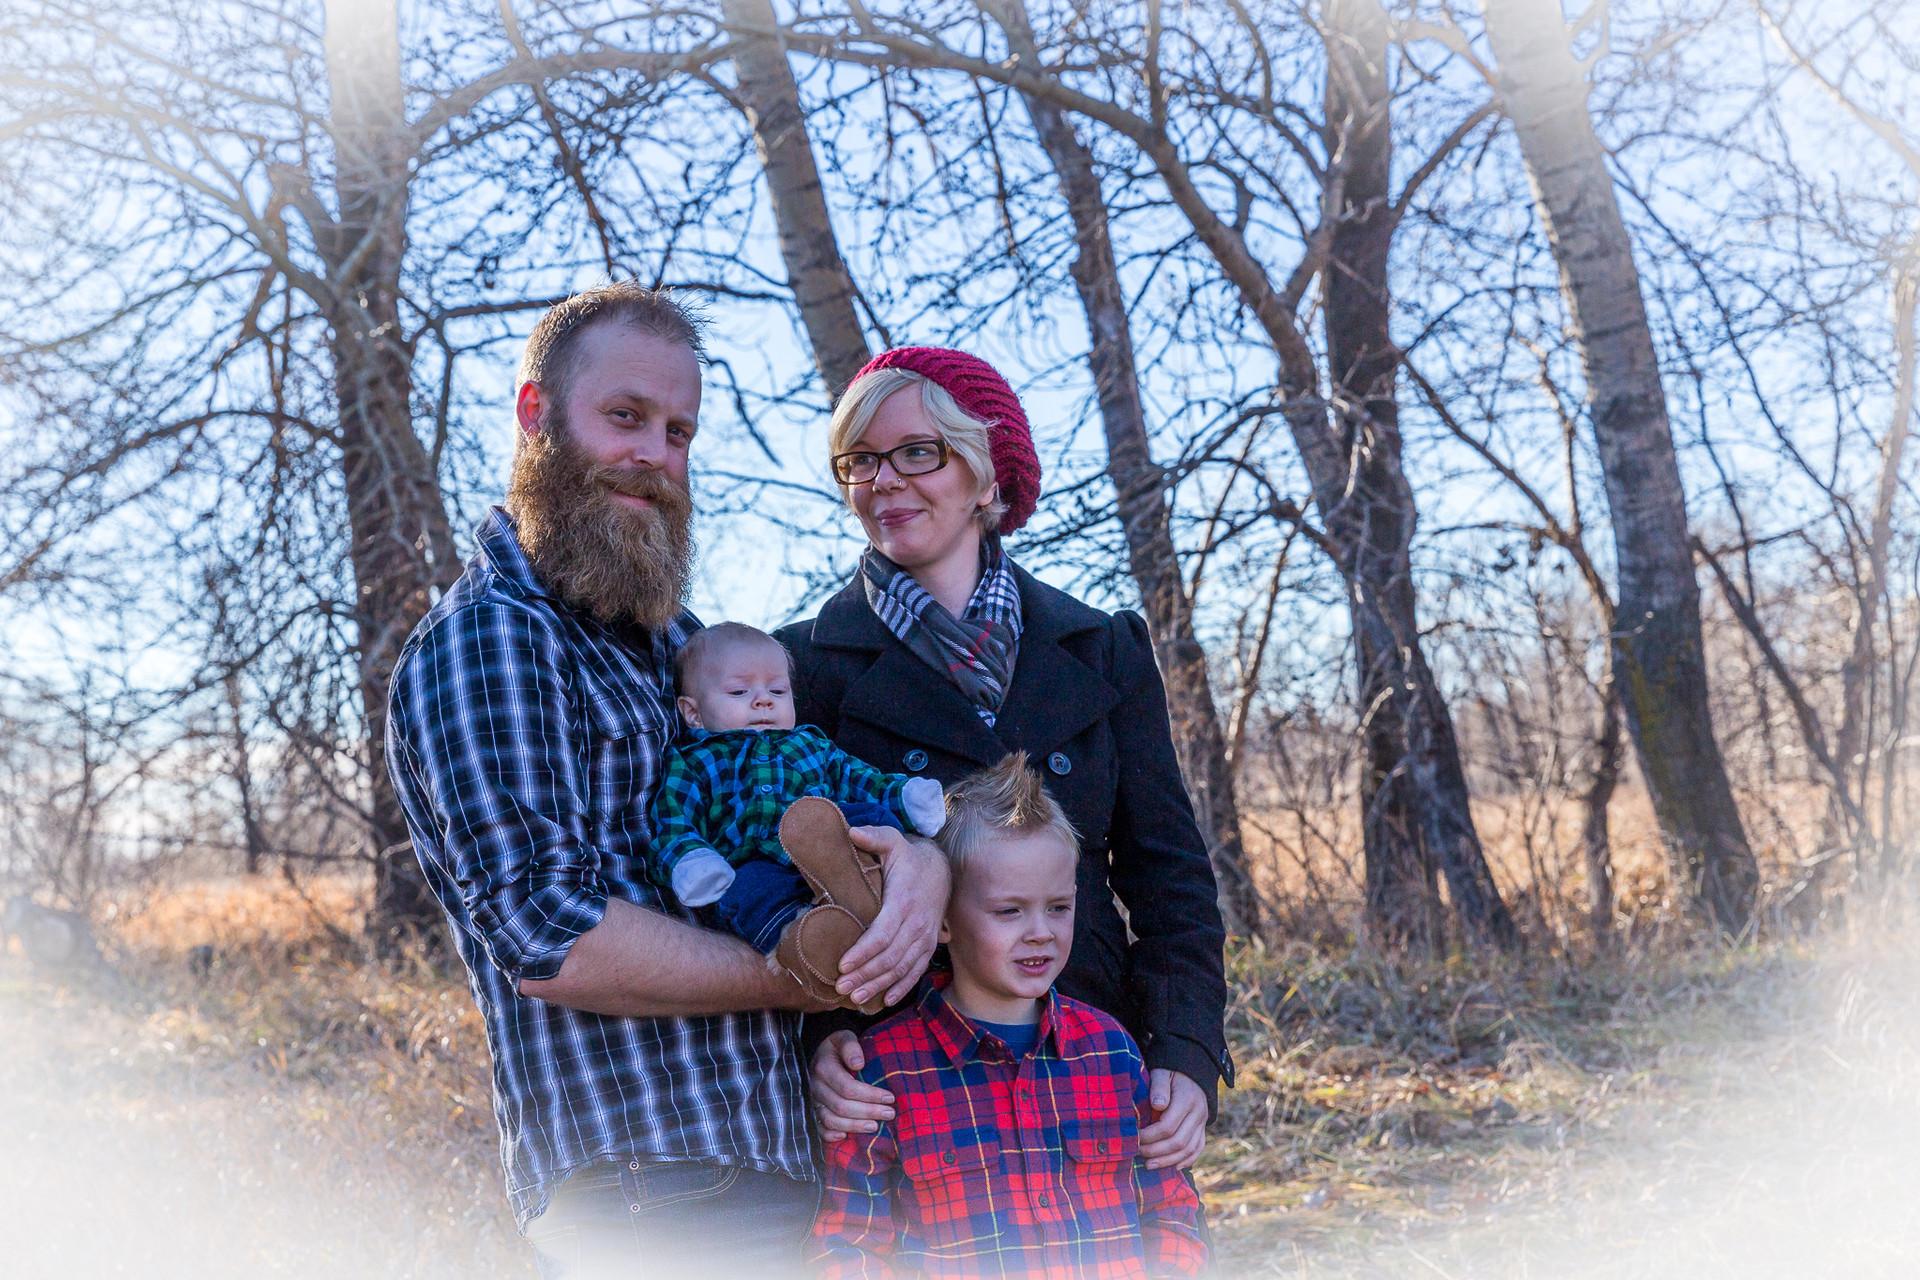 Calgary Photographer - Family Headshot photos